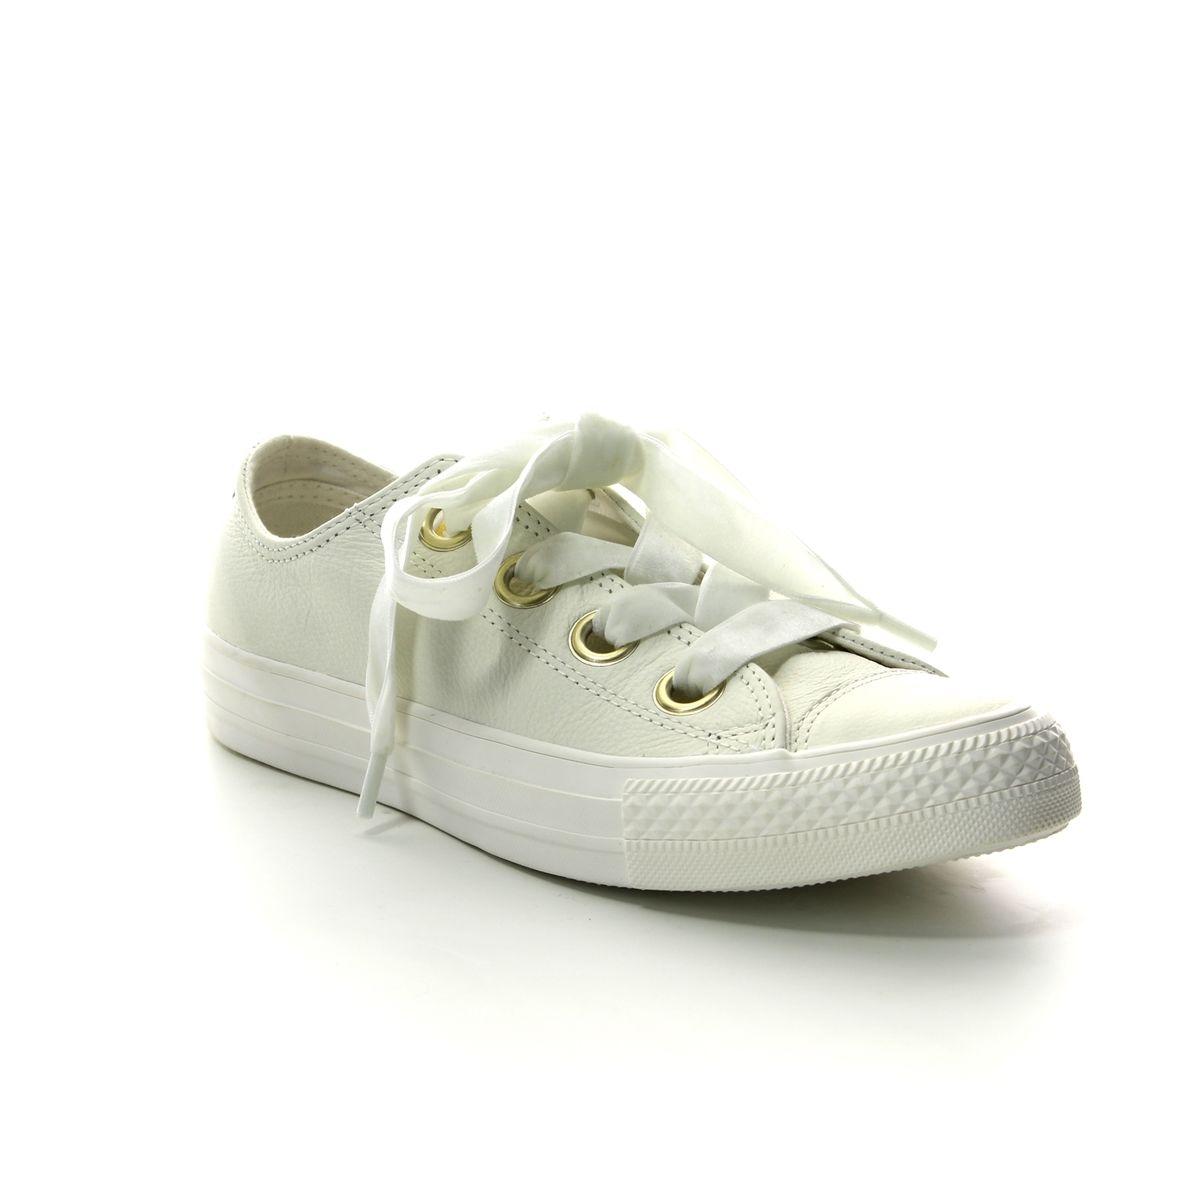 f573ac6b9a77 Converse Trainers - White - 561688C ALLSTAR RIBBON